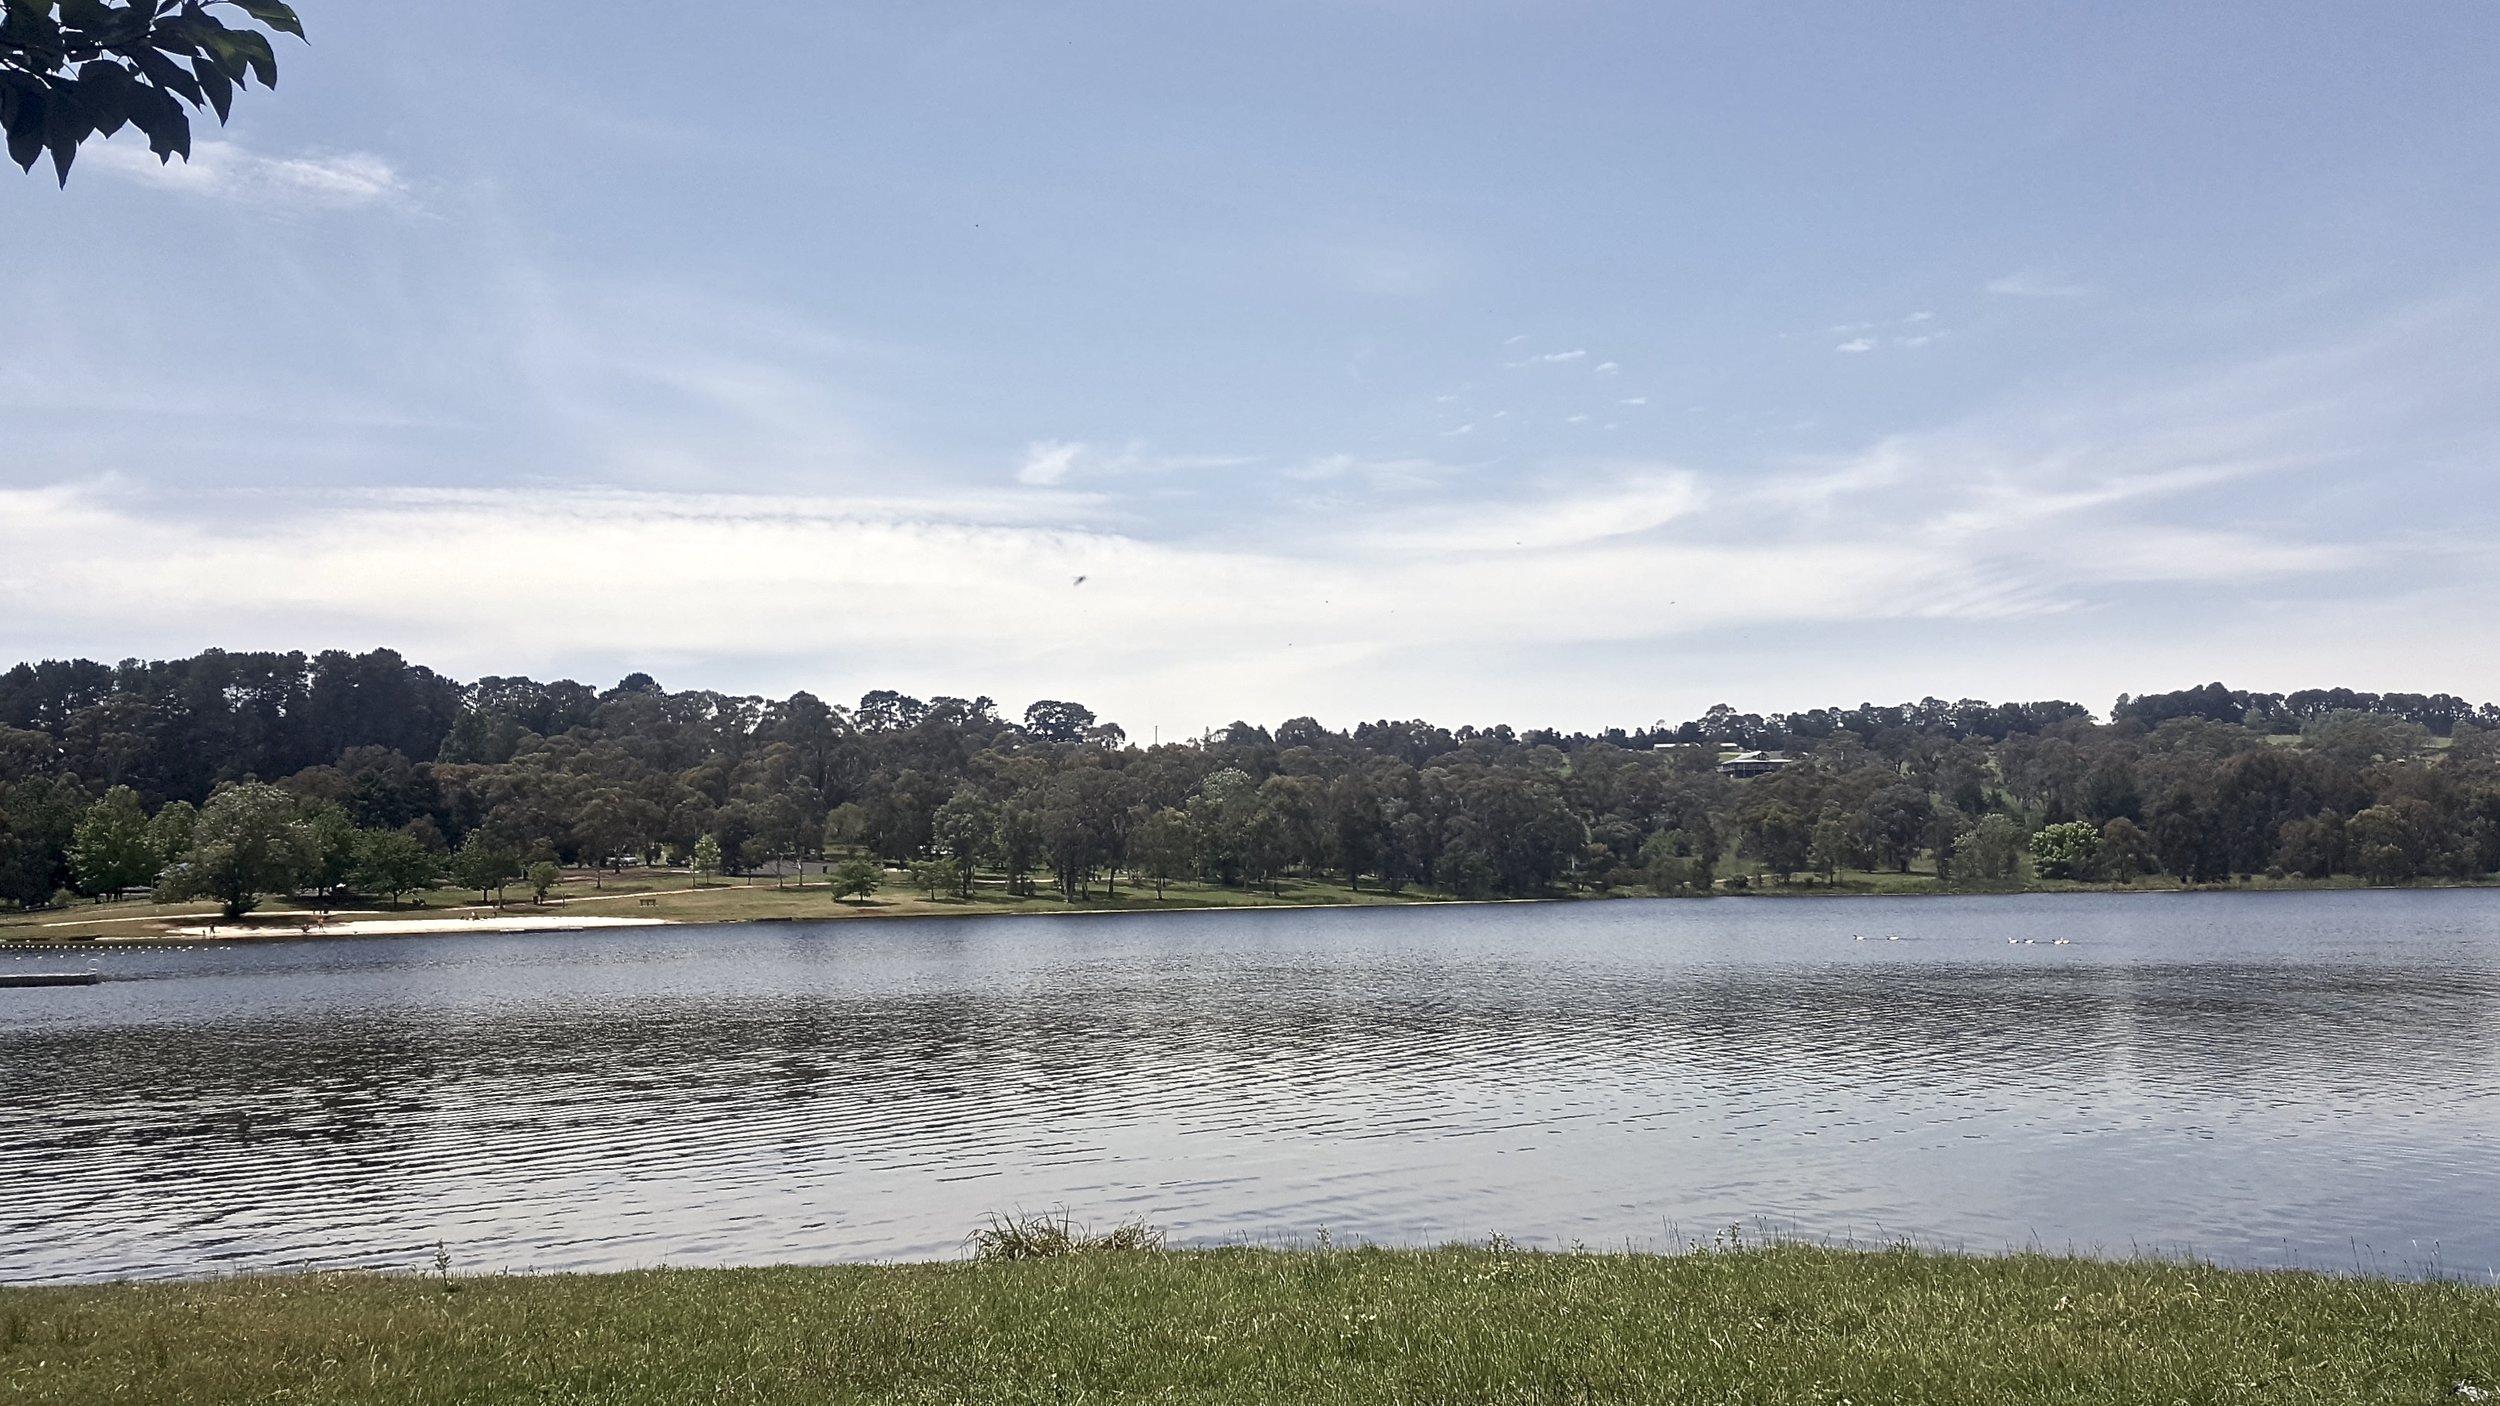 Lake Canobolas, Orange, Central New South Wales, Australia